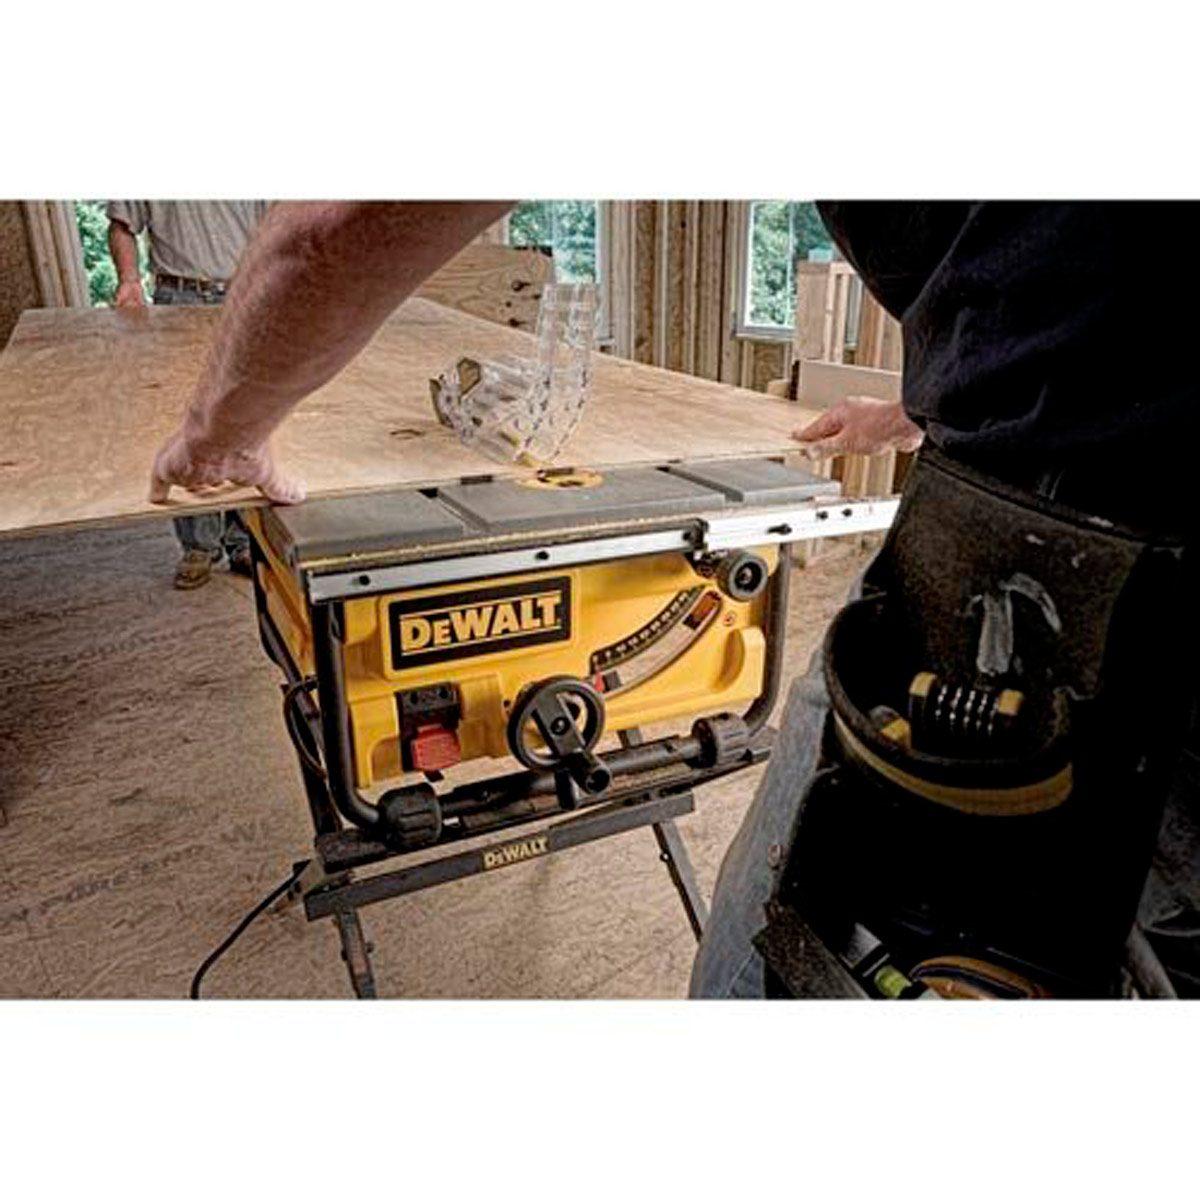 DeWalt-10-Inch-Compact-Job-Site-Table-Saw